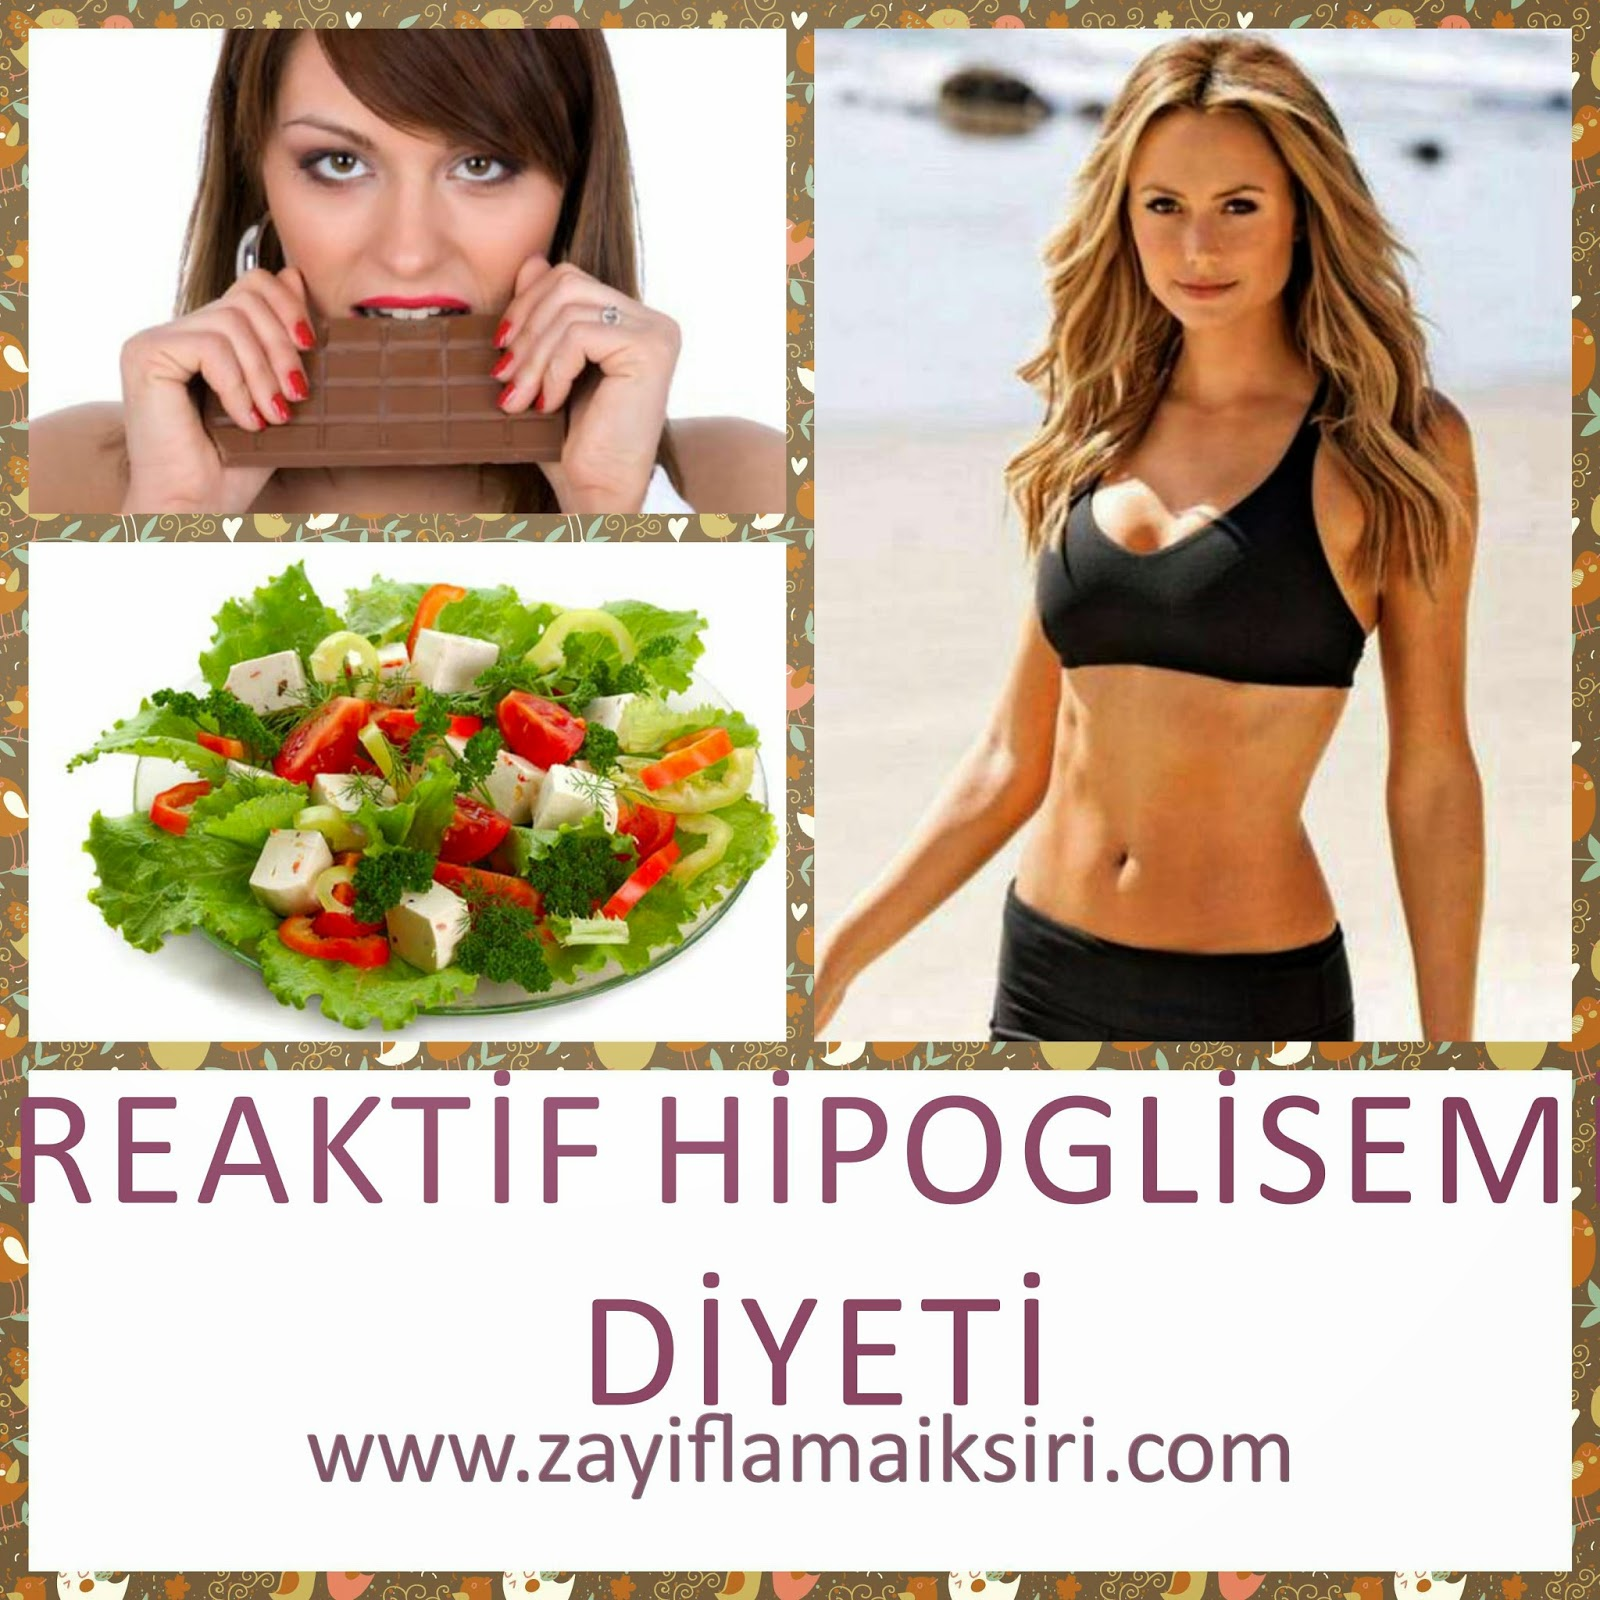 Reaktif Postprandial Hipoglisemi ve Diyet Tedavisi 53